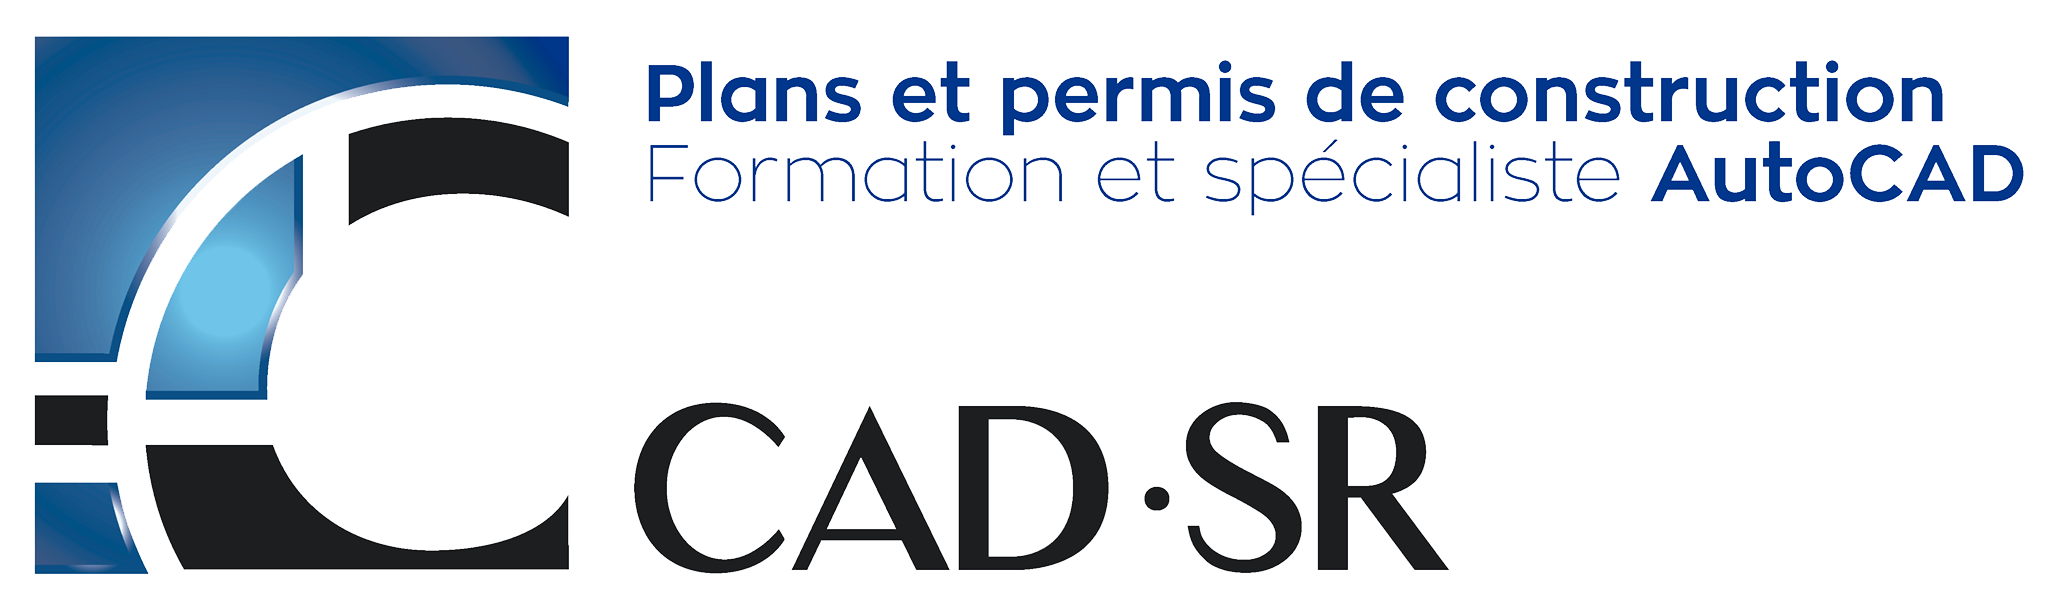 Stéphanie Racine CAD-SR Dessinatrice AutoCAD